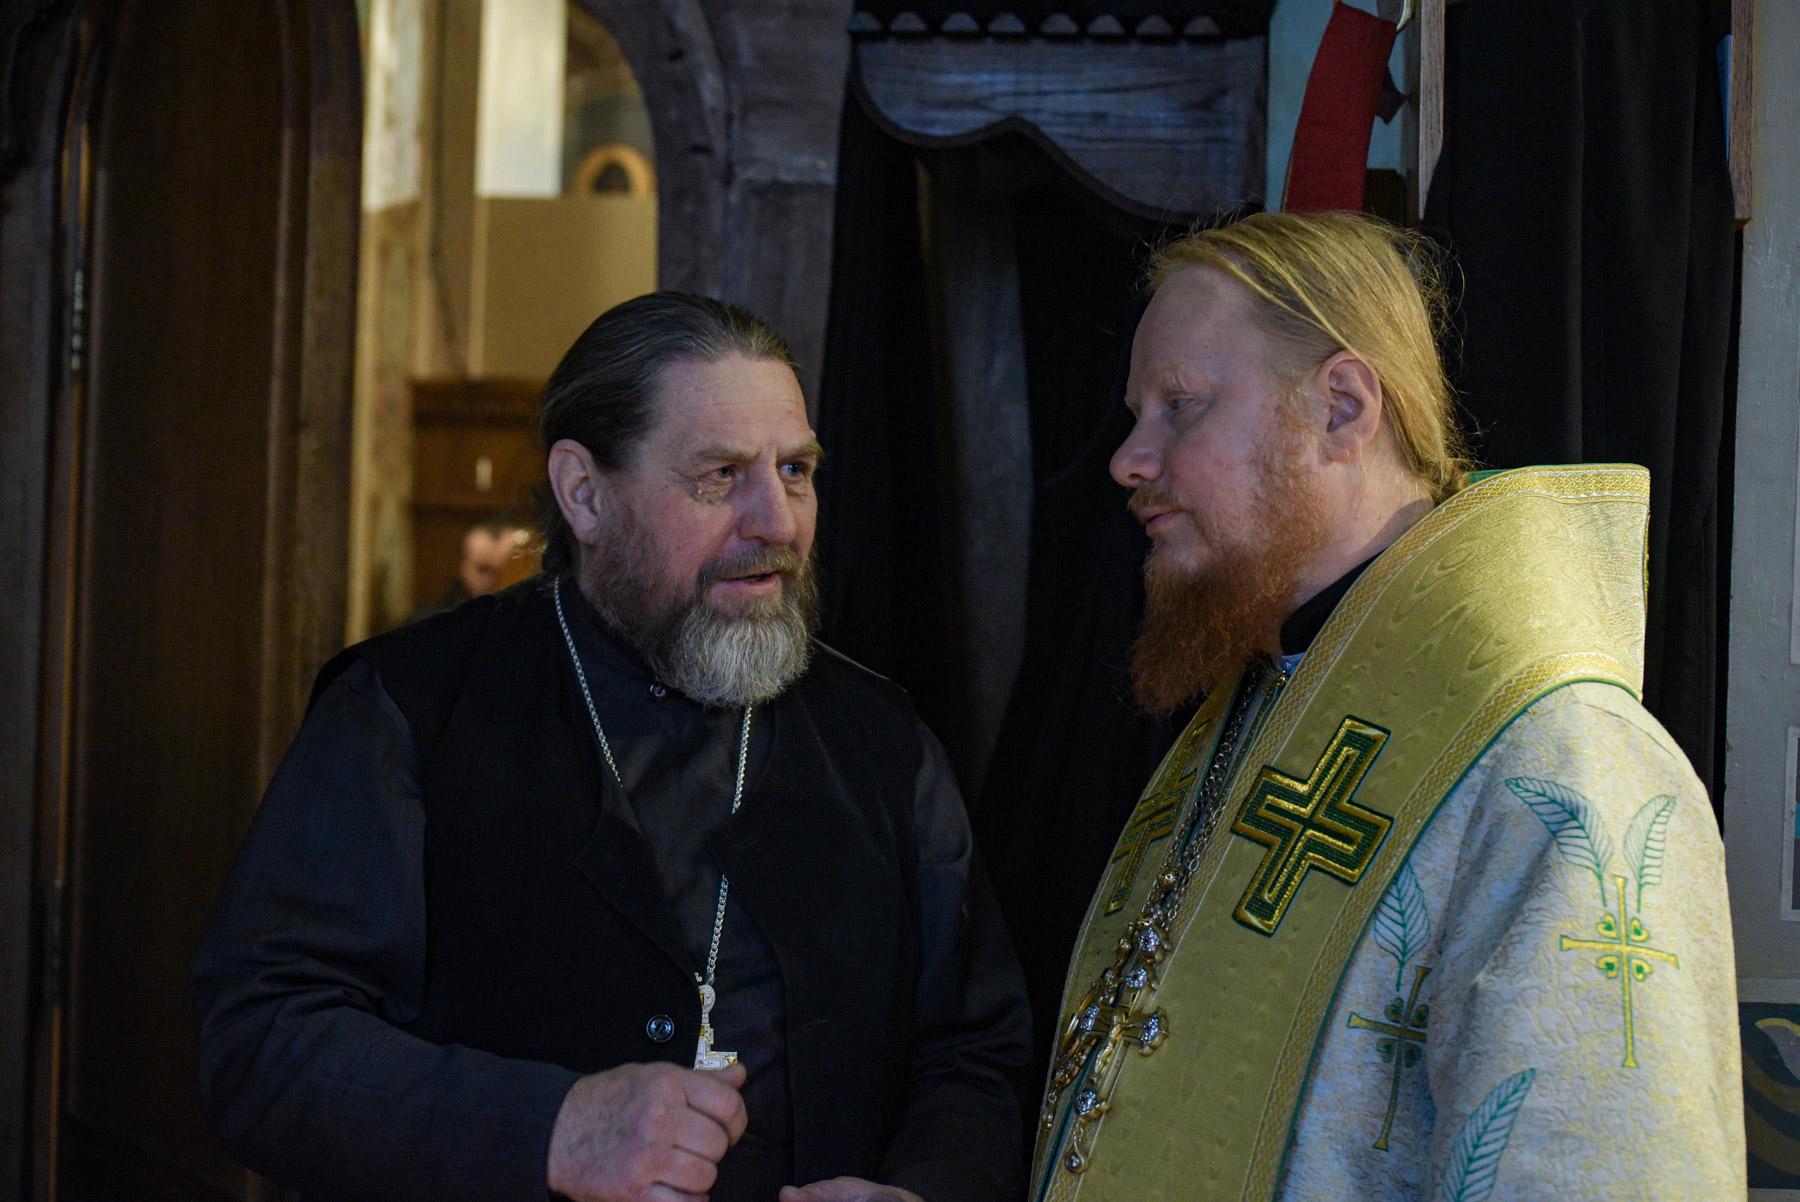 photos of orthodox christmas 0160 2